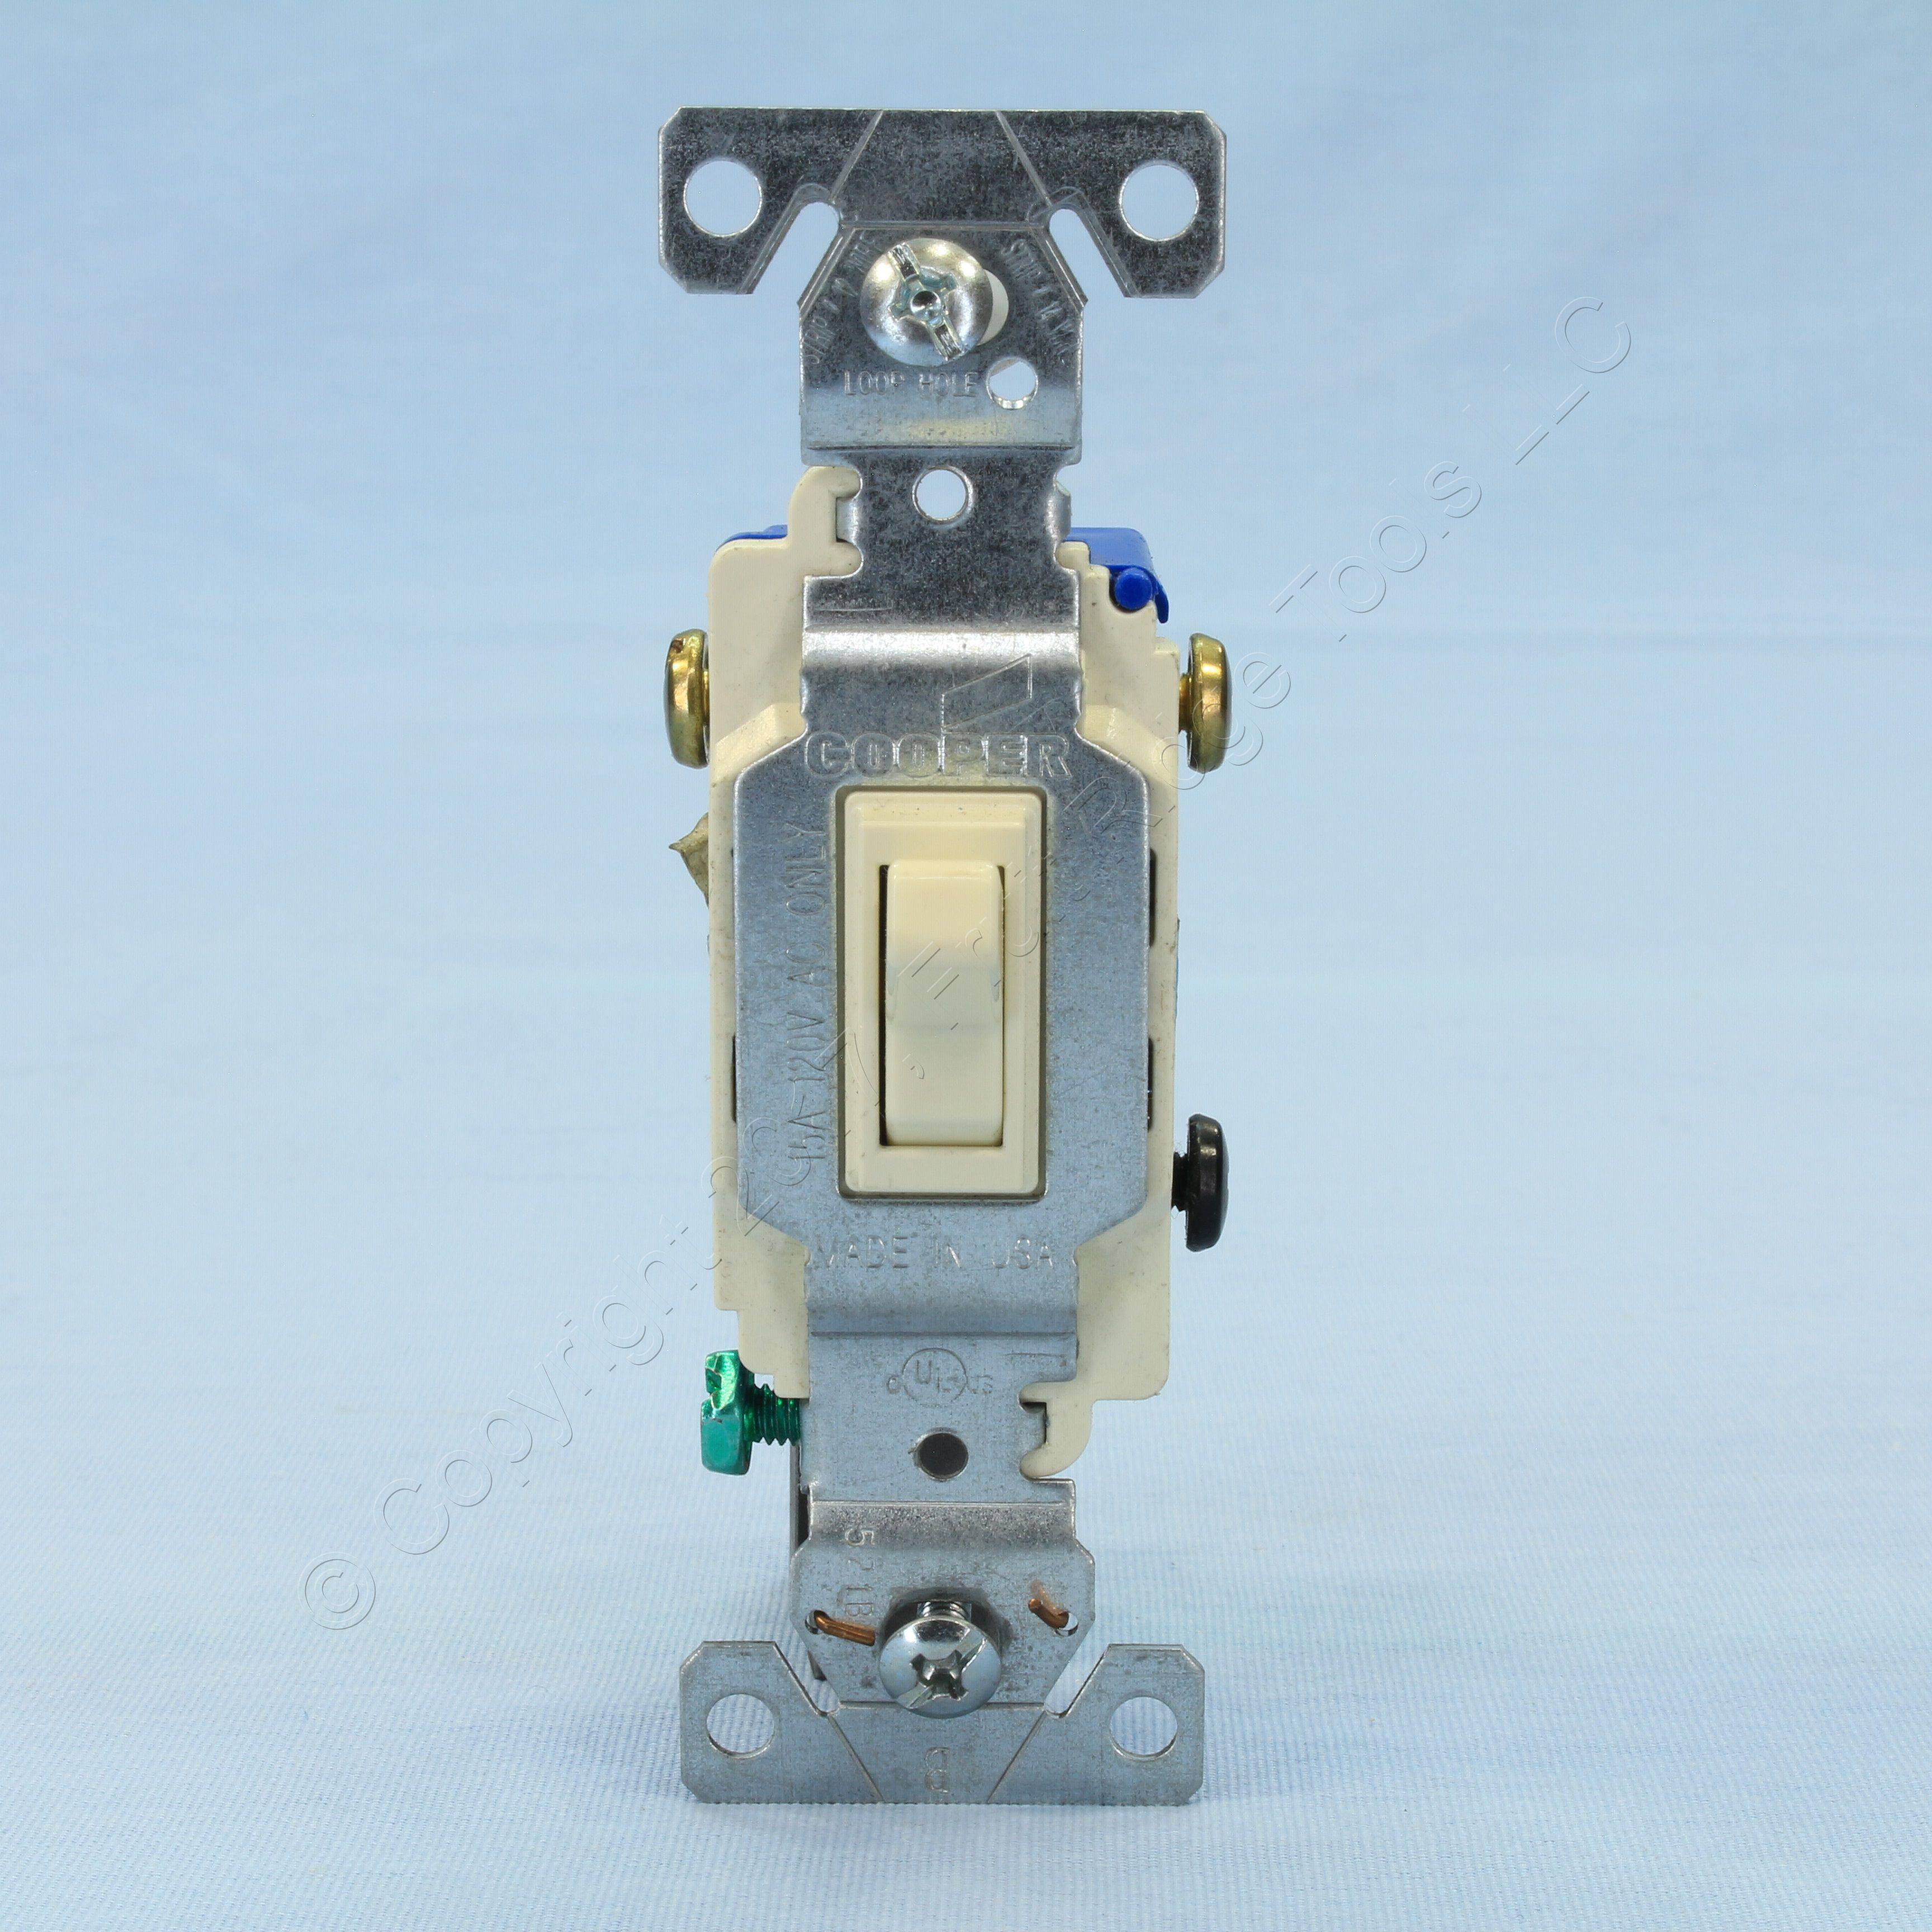 cooper single pole toggle light switch auto grounding 3 way 15a 120v